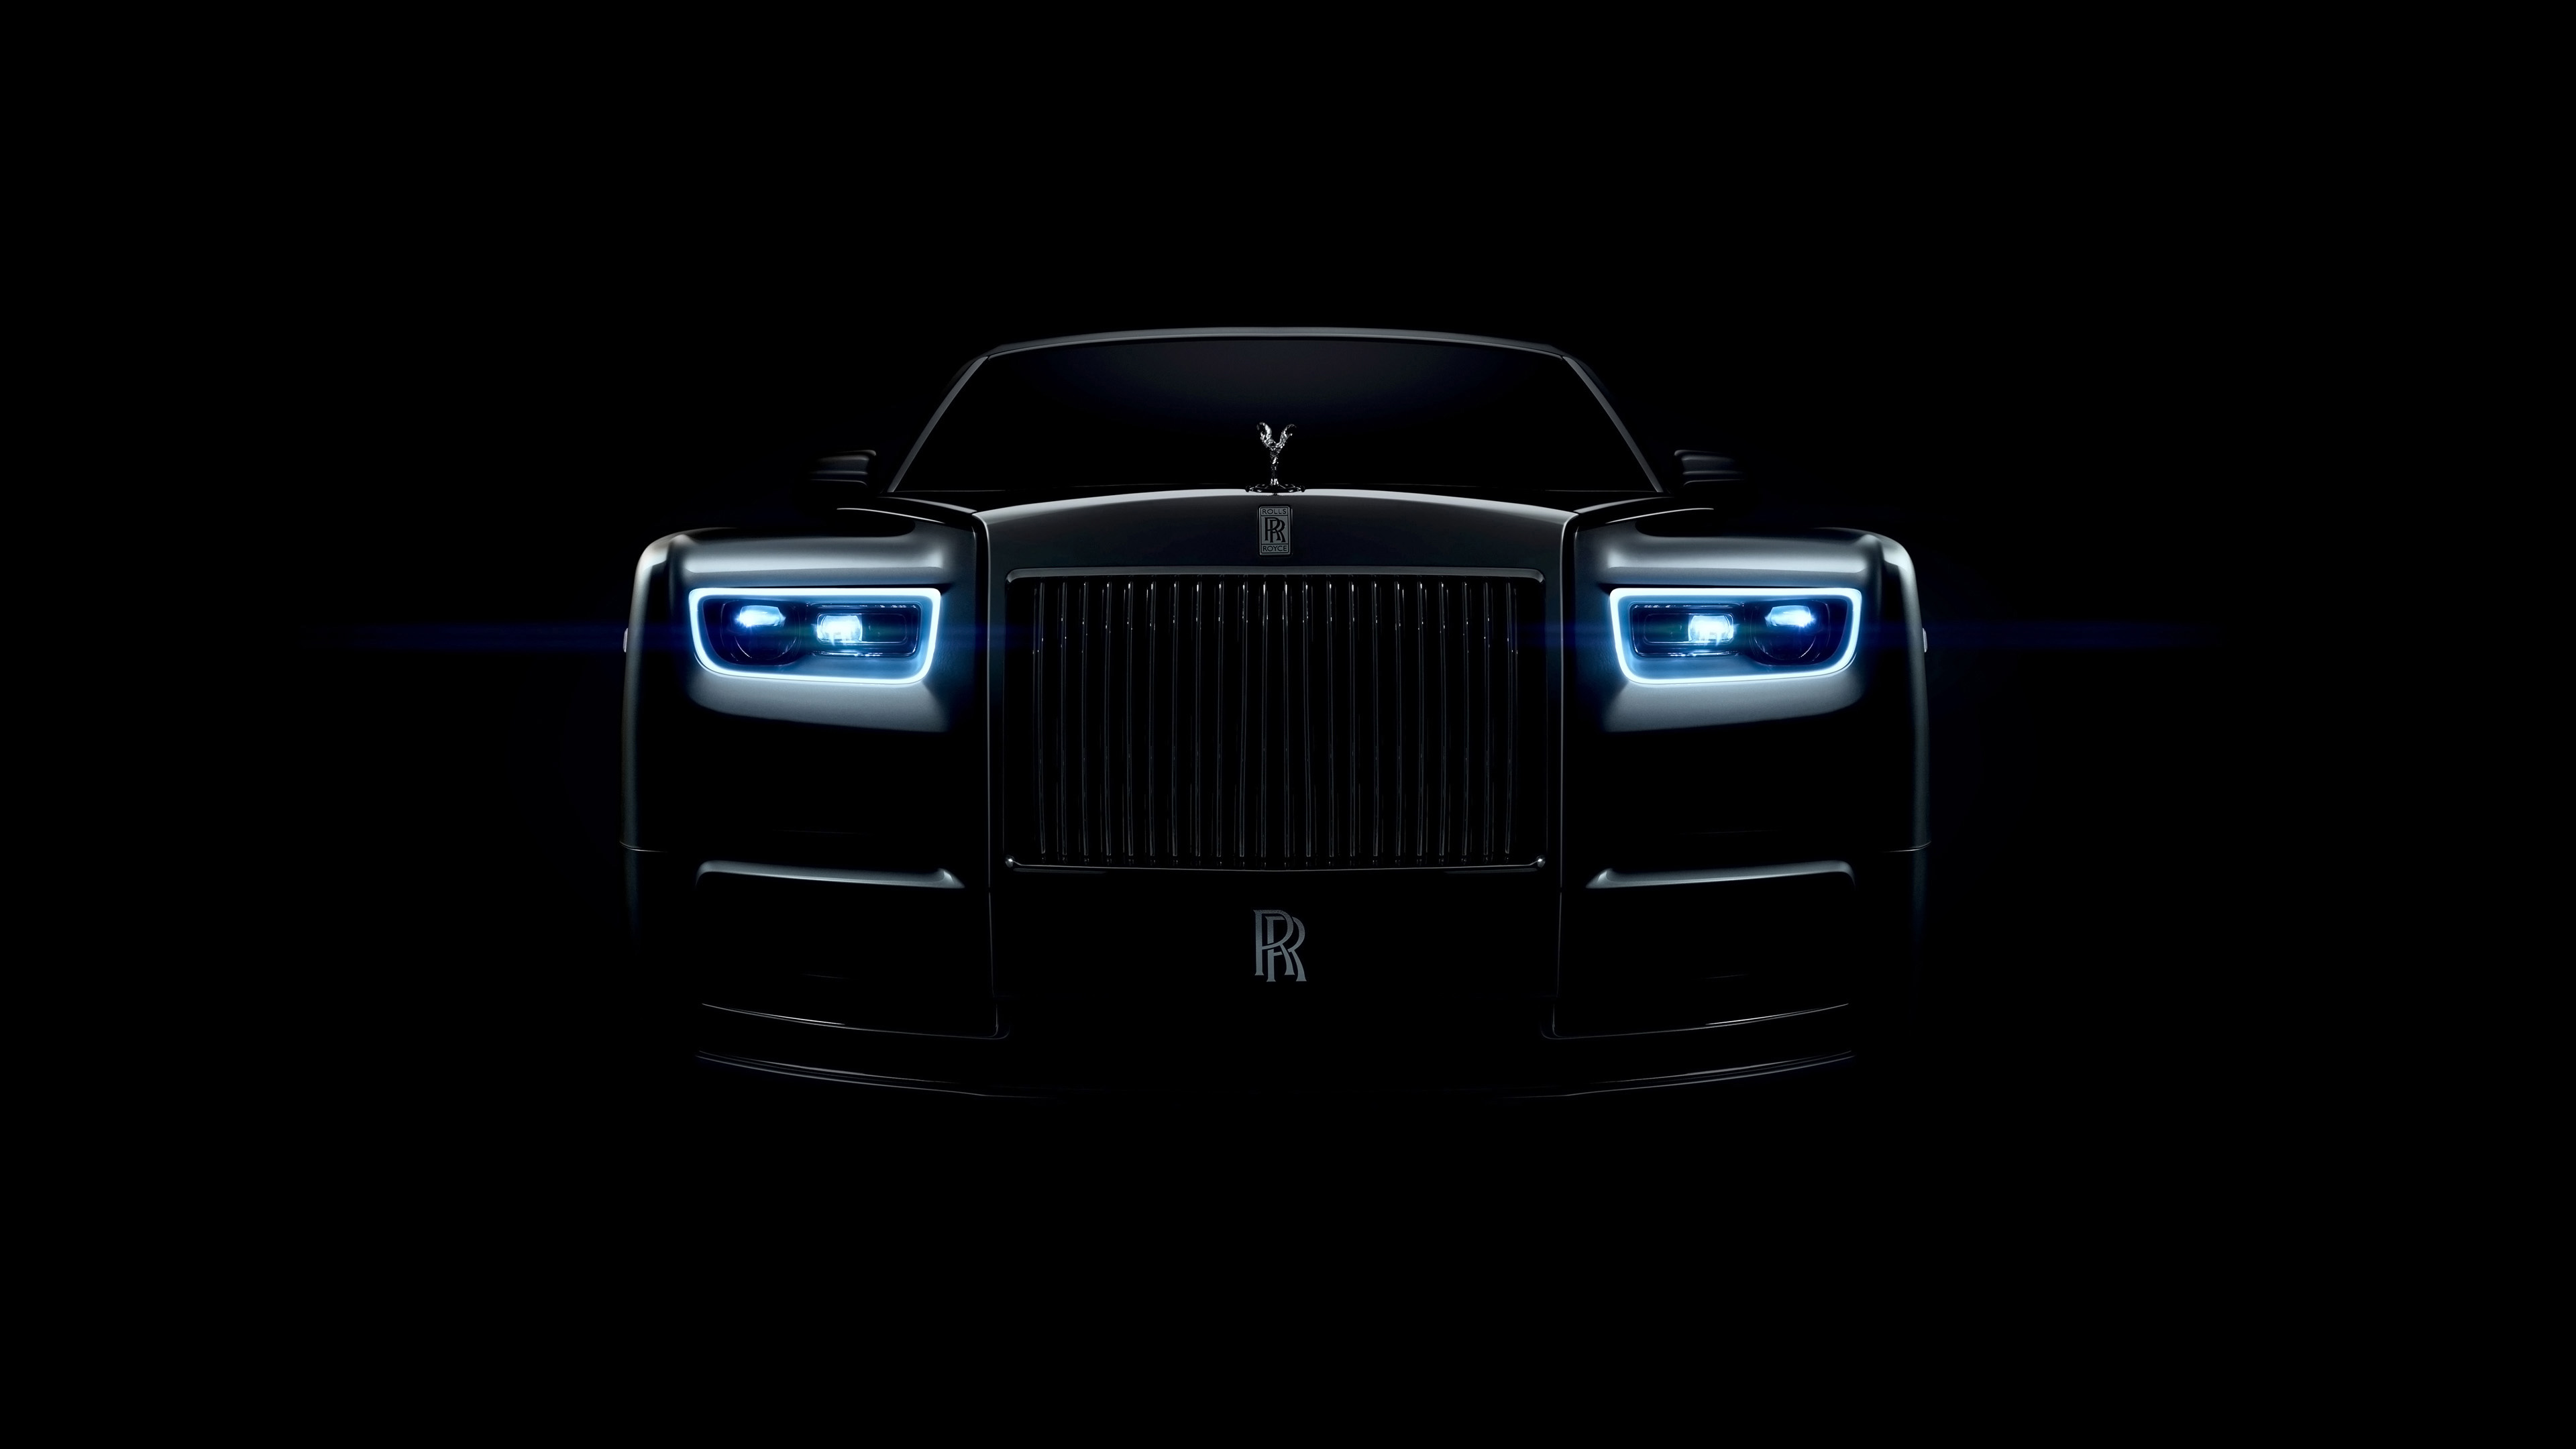 2018 Rolls Royce Phantom Wallpaper | HD Car Wallpapers ...